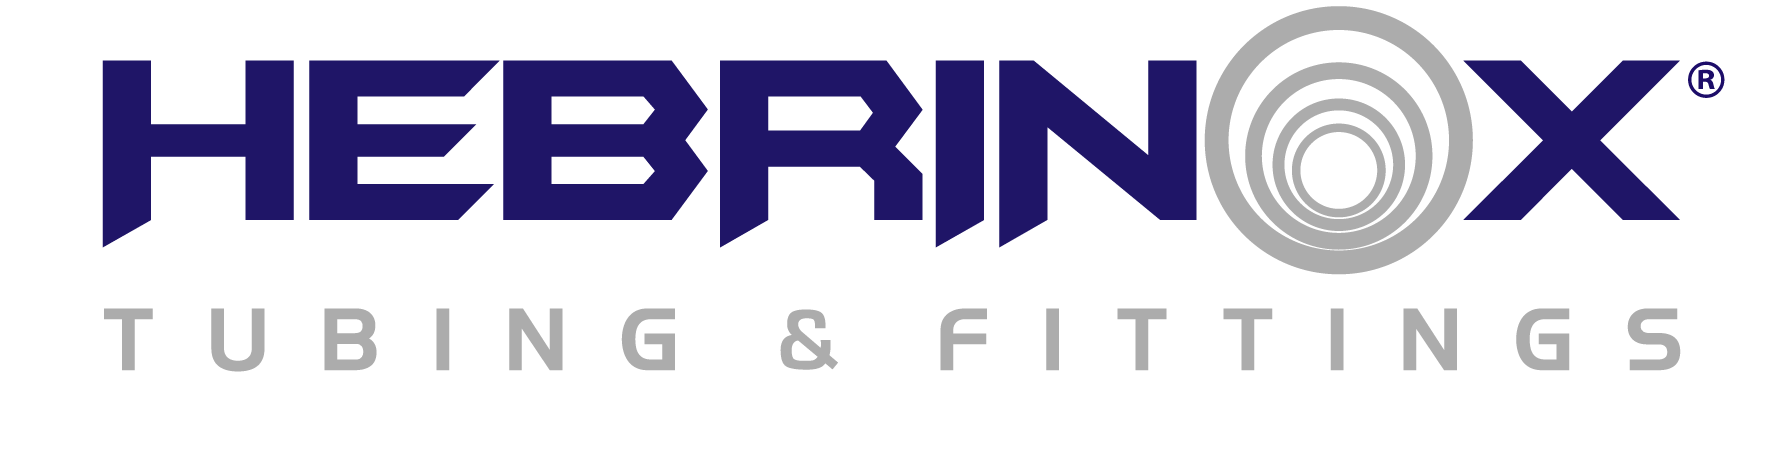 Logo HEBRINOX ingles